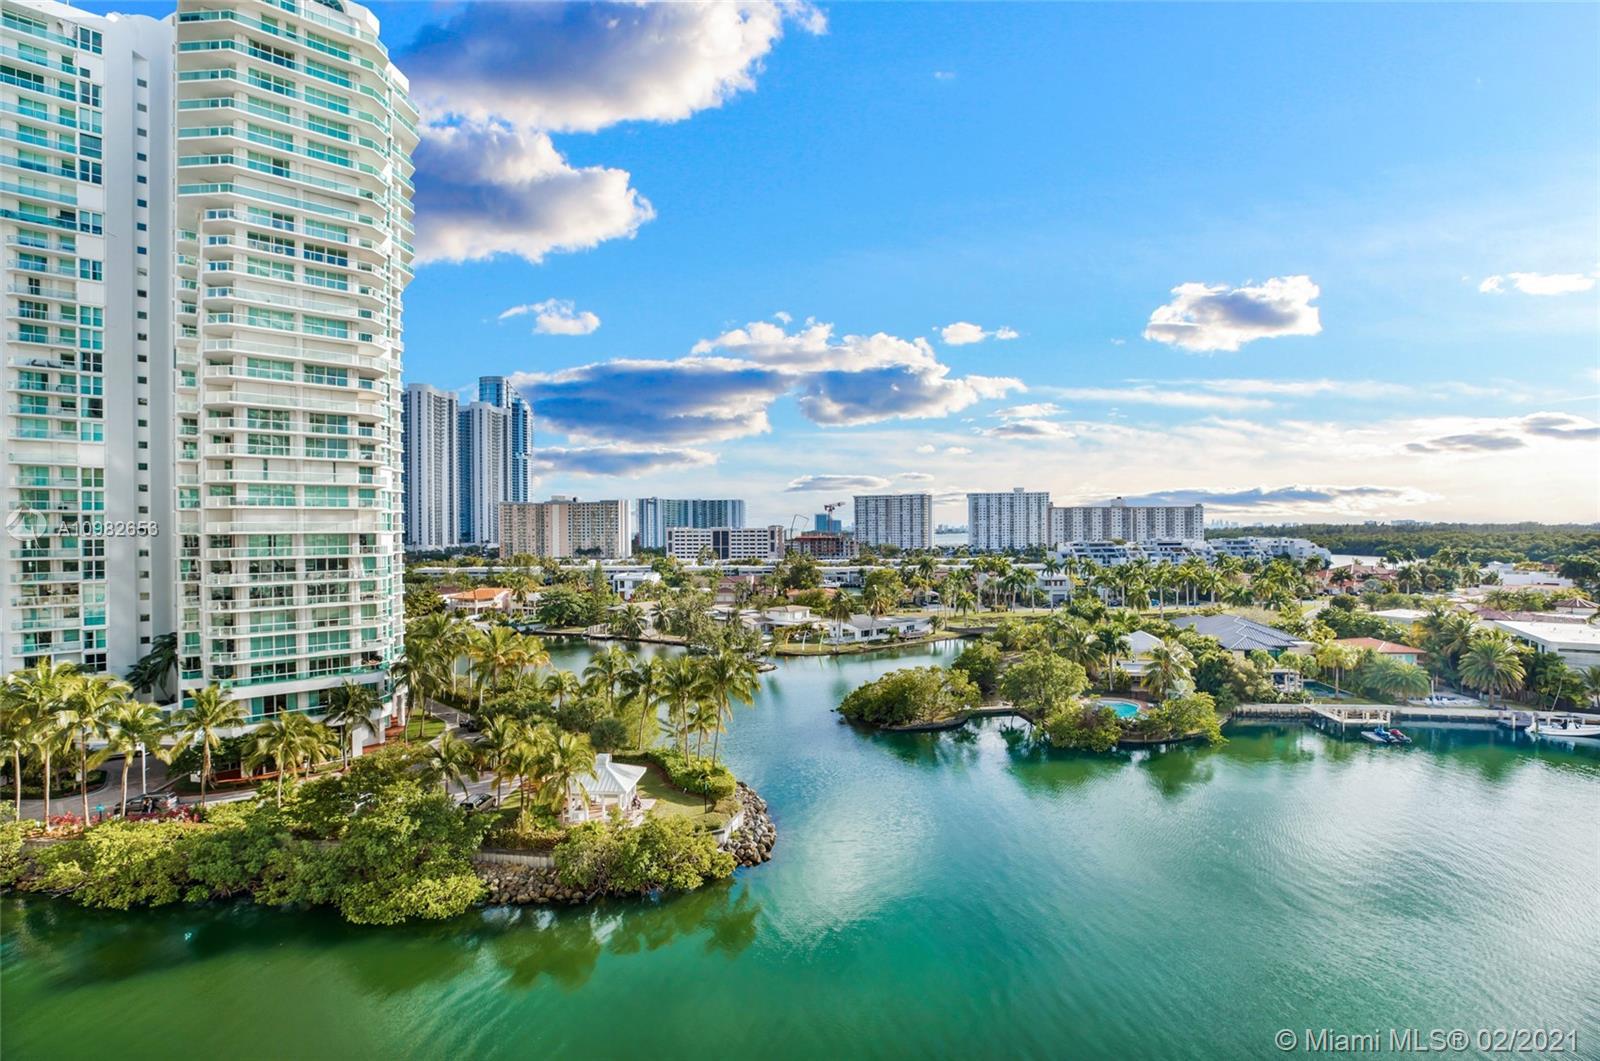 Parque Tower 2 #5808 - 330 Sunny Isles Blvd #5808, Sunny Isles Beach, FL 33160